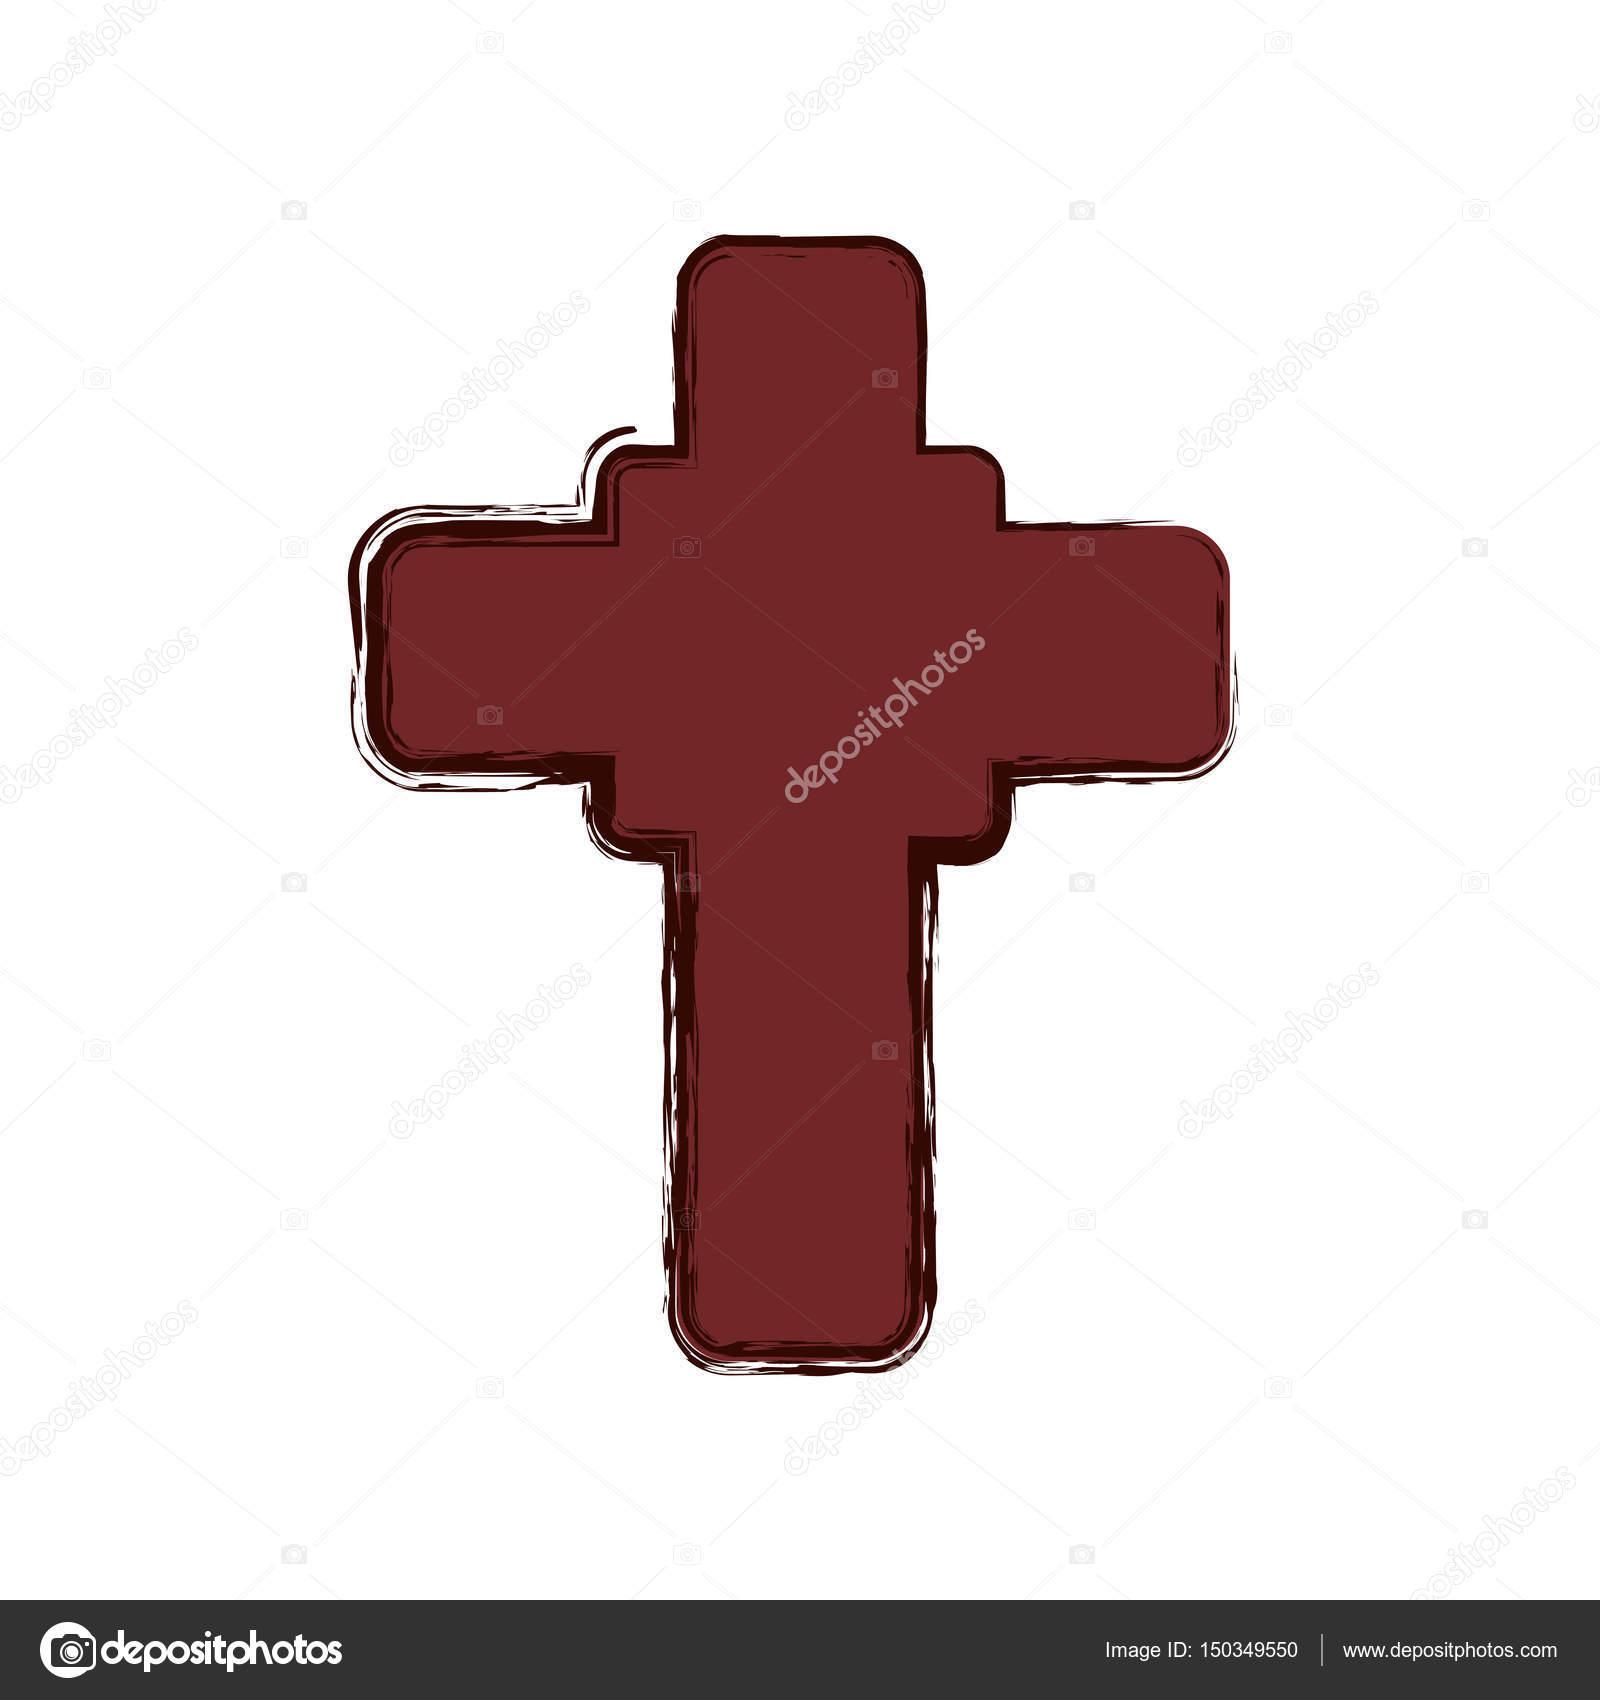 Christianity cross symbol stock vector djv 150349550 christianity cross symbol icon vector illustration graphic design vector by djv biocorpaavc Gallery